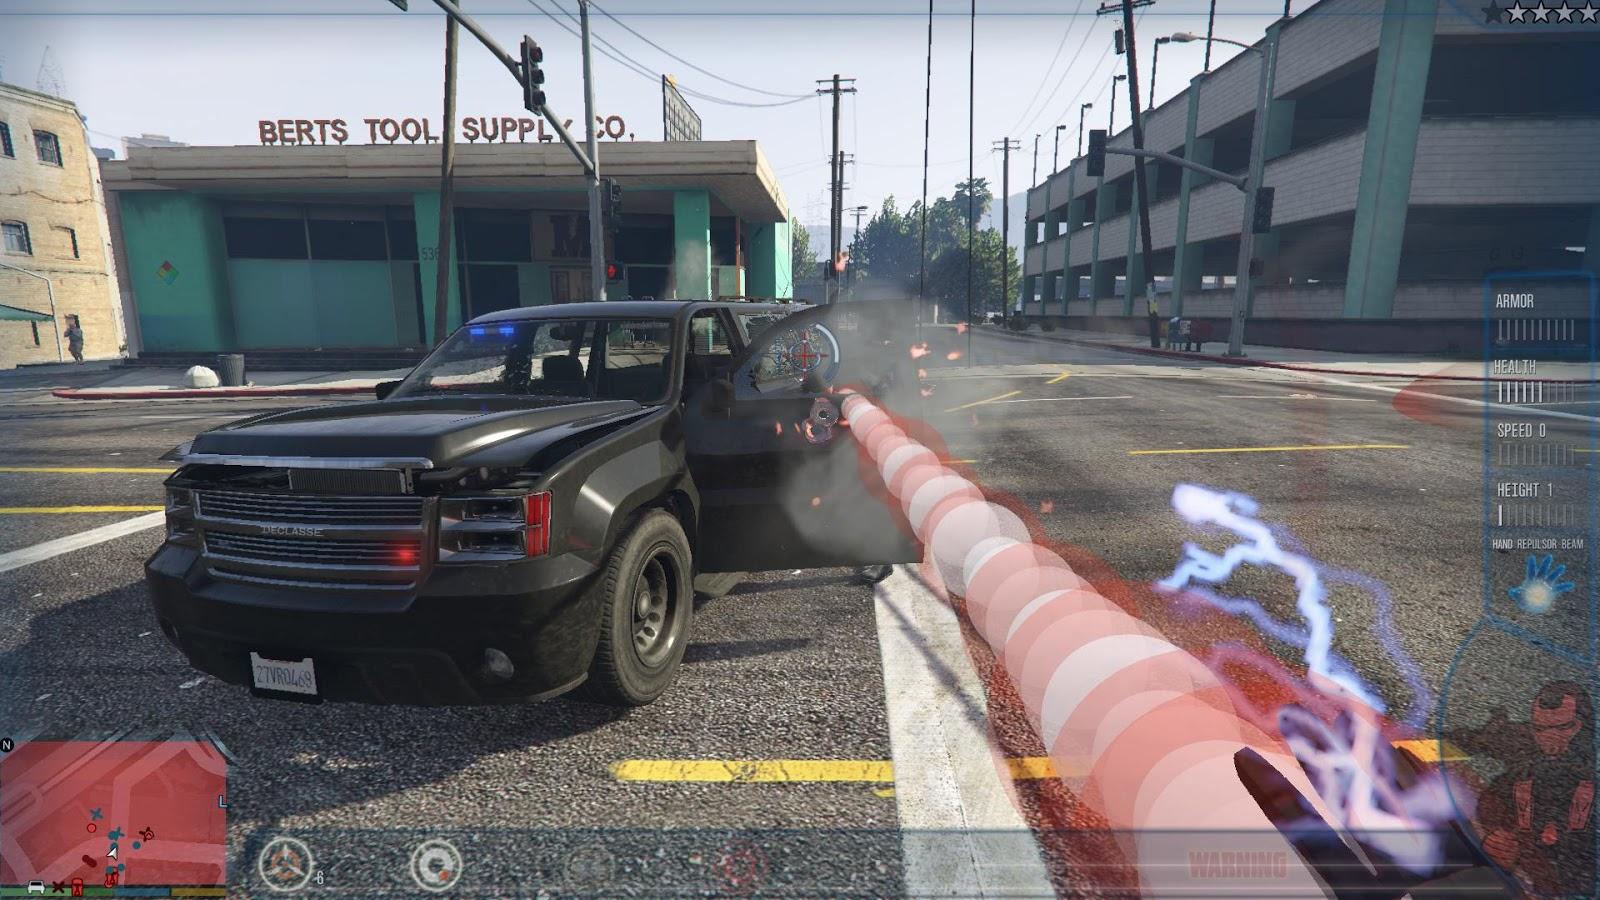 GTA X Scripting: GTA V Ironman v2 0 - Download and